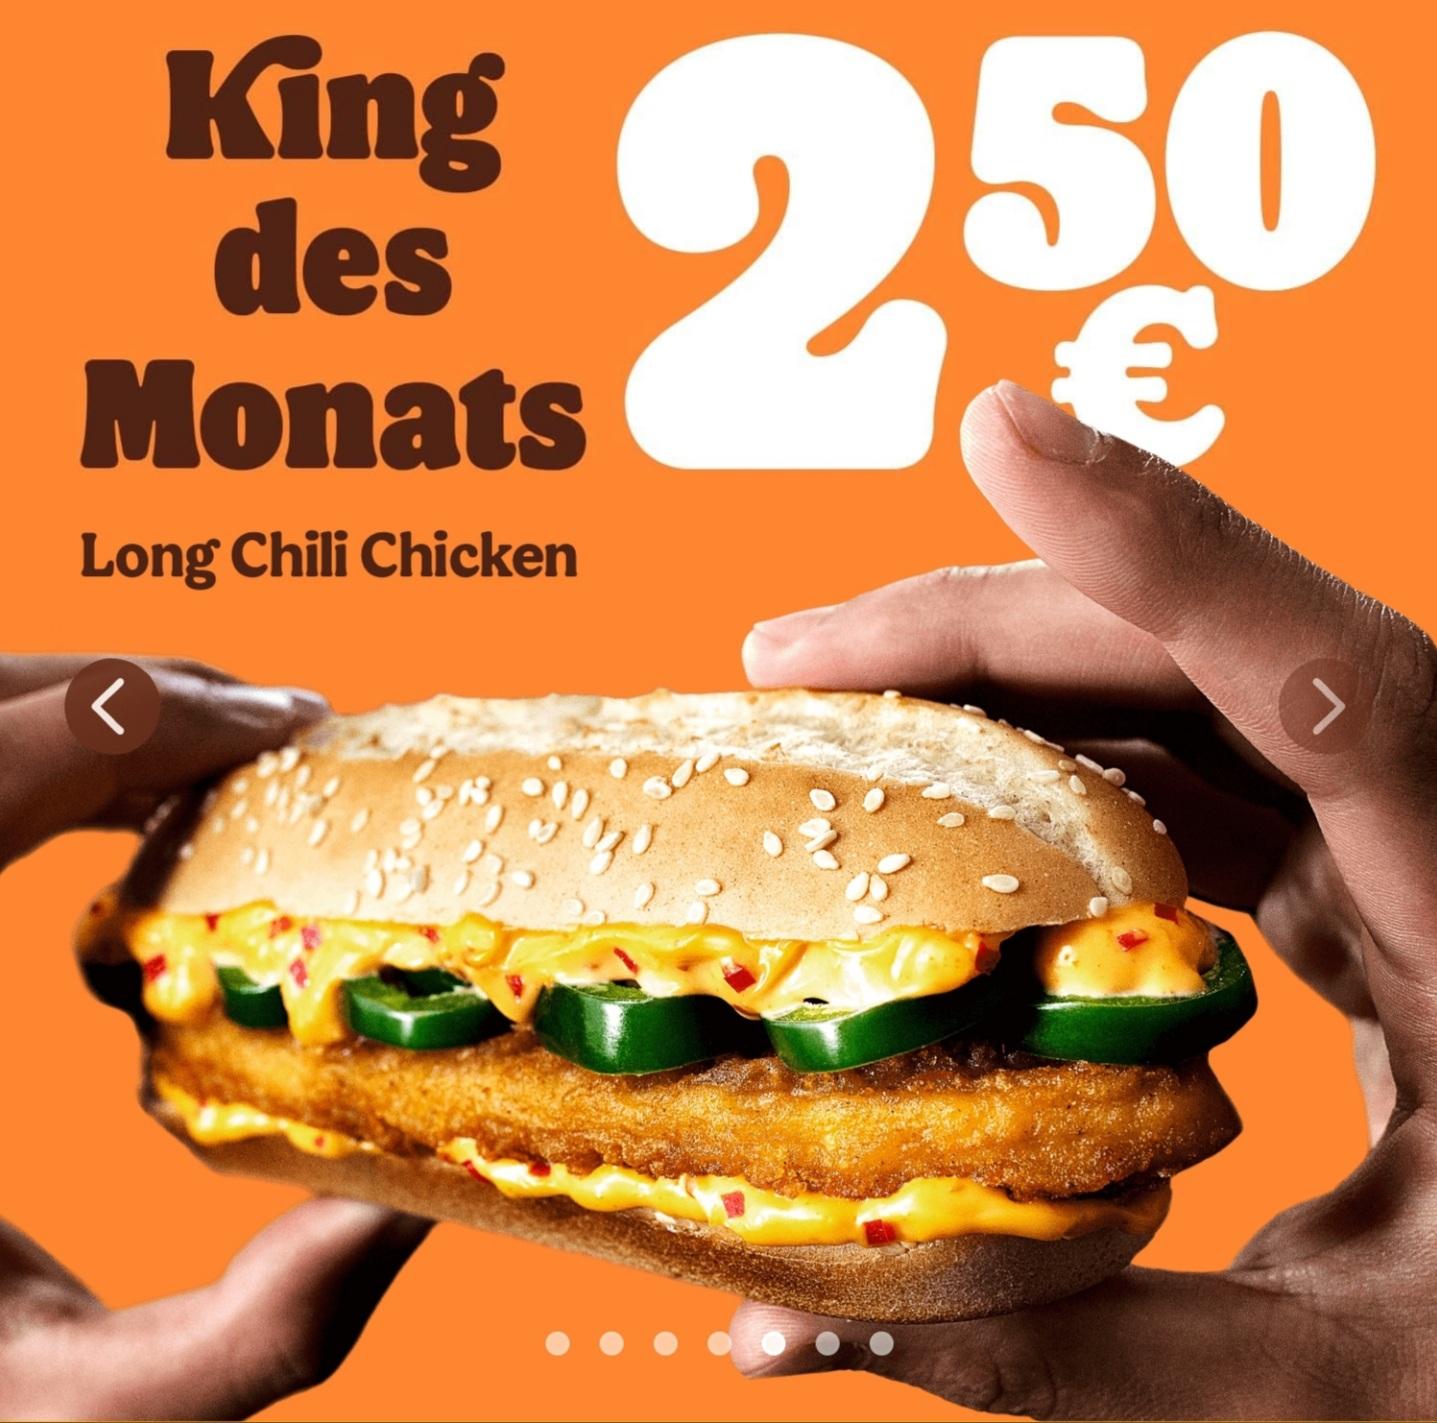 "Burger King ""King des Monats"" Long Chili Chicken im Februar um nur 2,50 Euro"